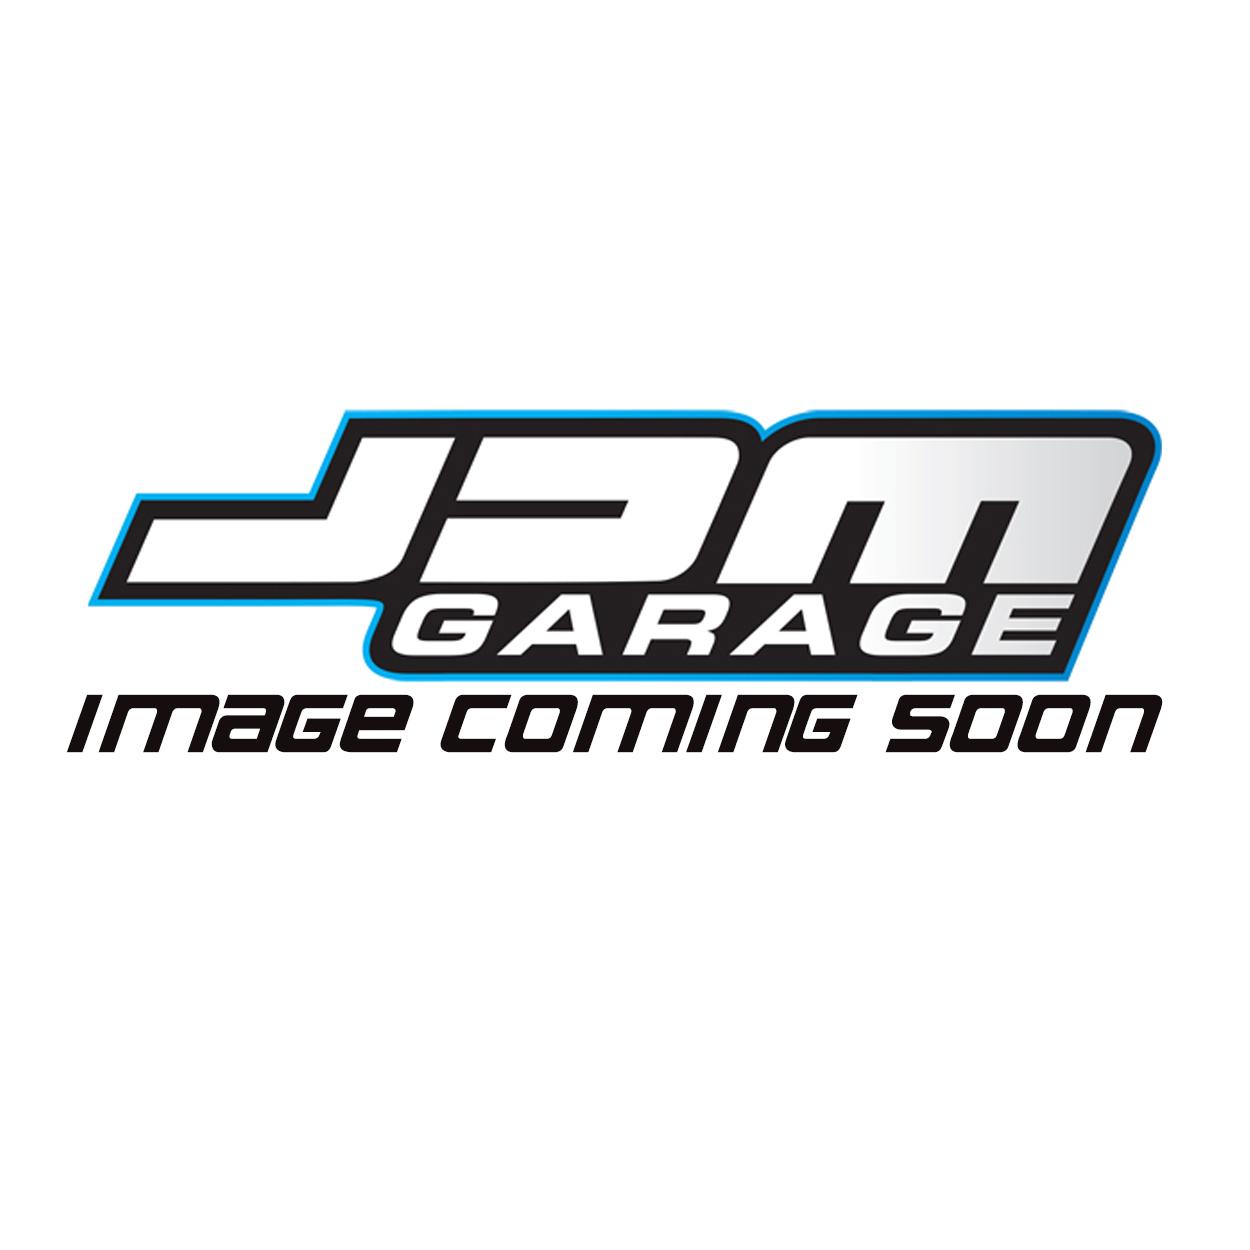 Genuine Nissan OEM Rocker Arm For Nissan Silvia S13 S14 S15 SR20DE SR20DET 13257-53J03